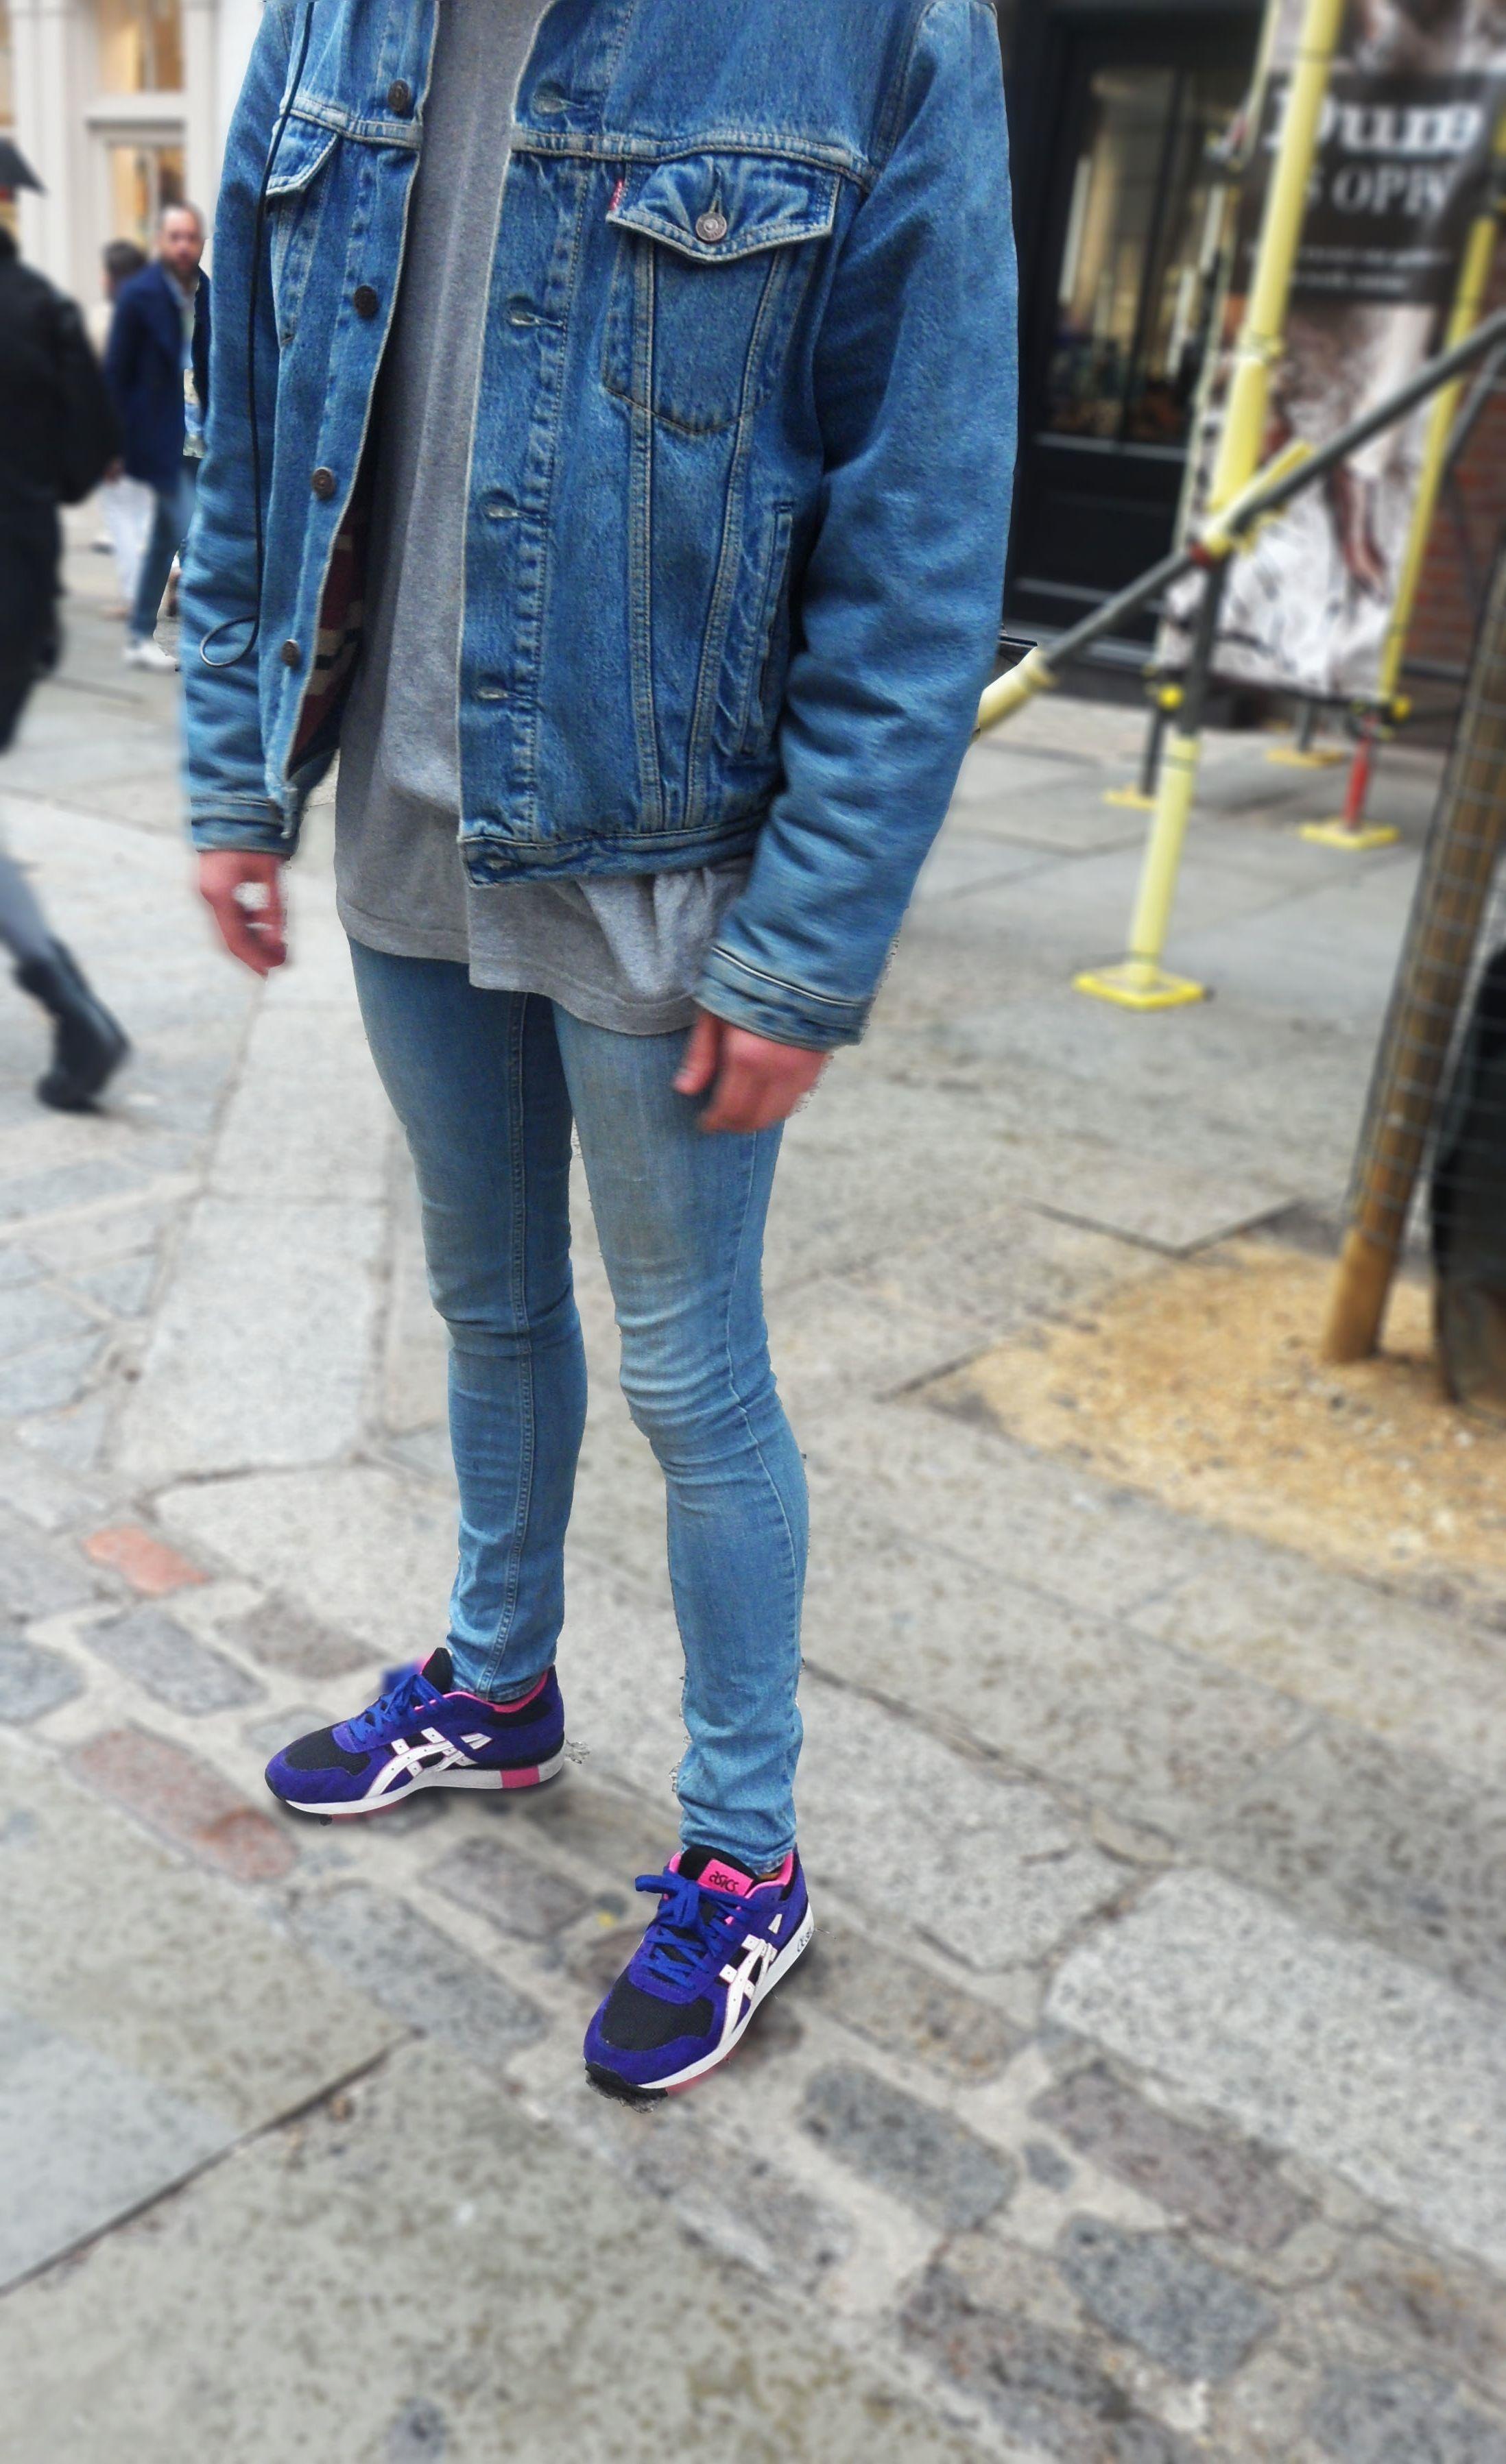 Double Denim #denim #levi #skinnyjeans #trainers #denimjacket #menswear #streetstyle #london